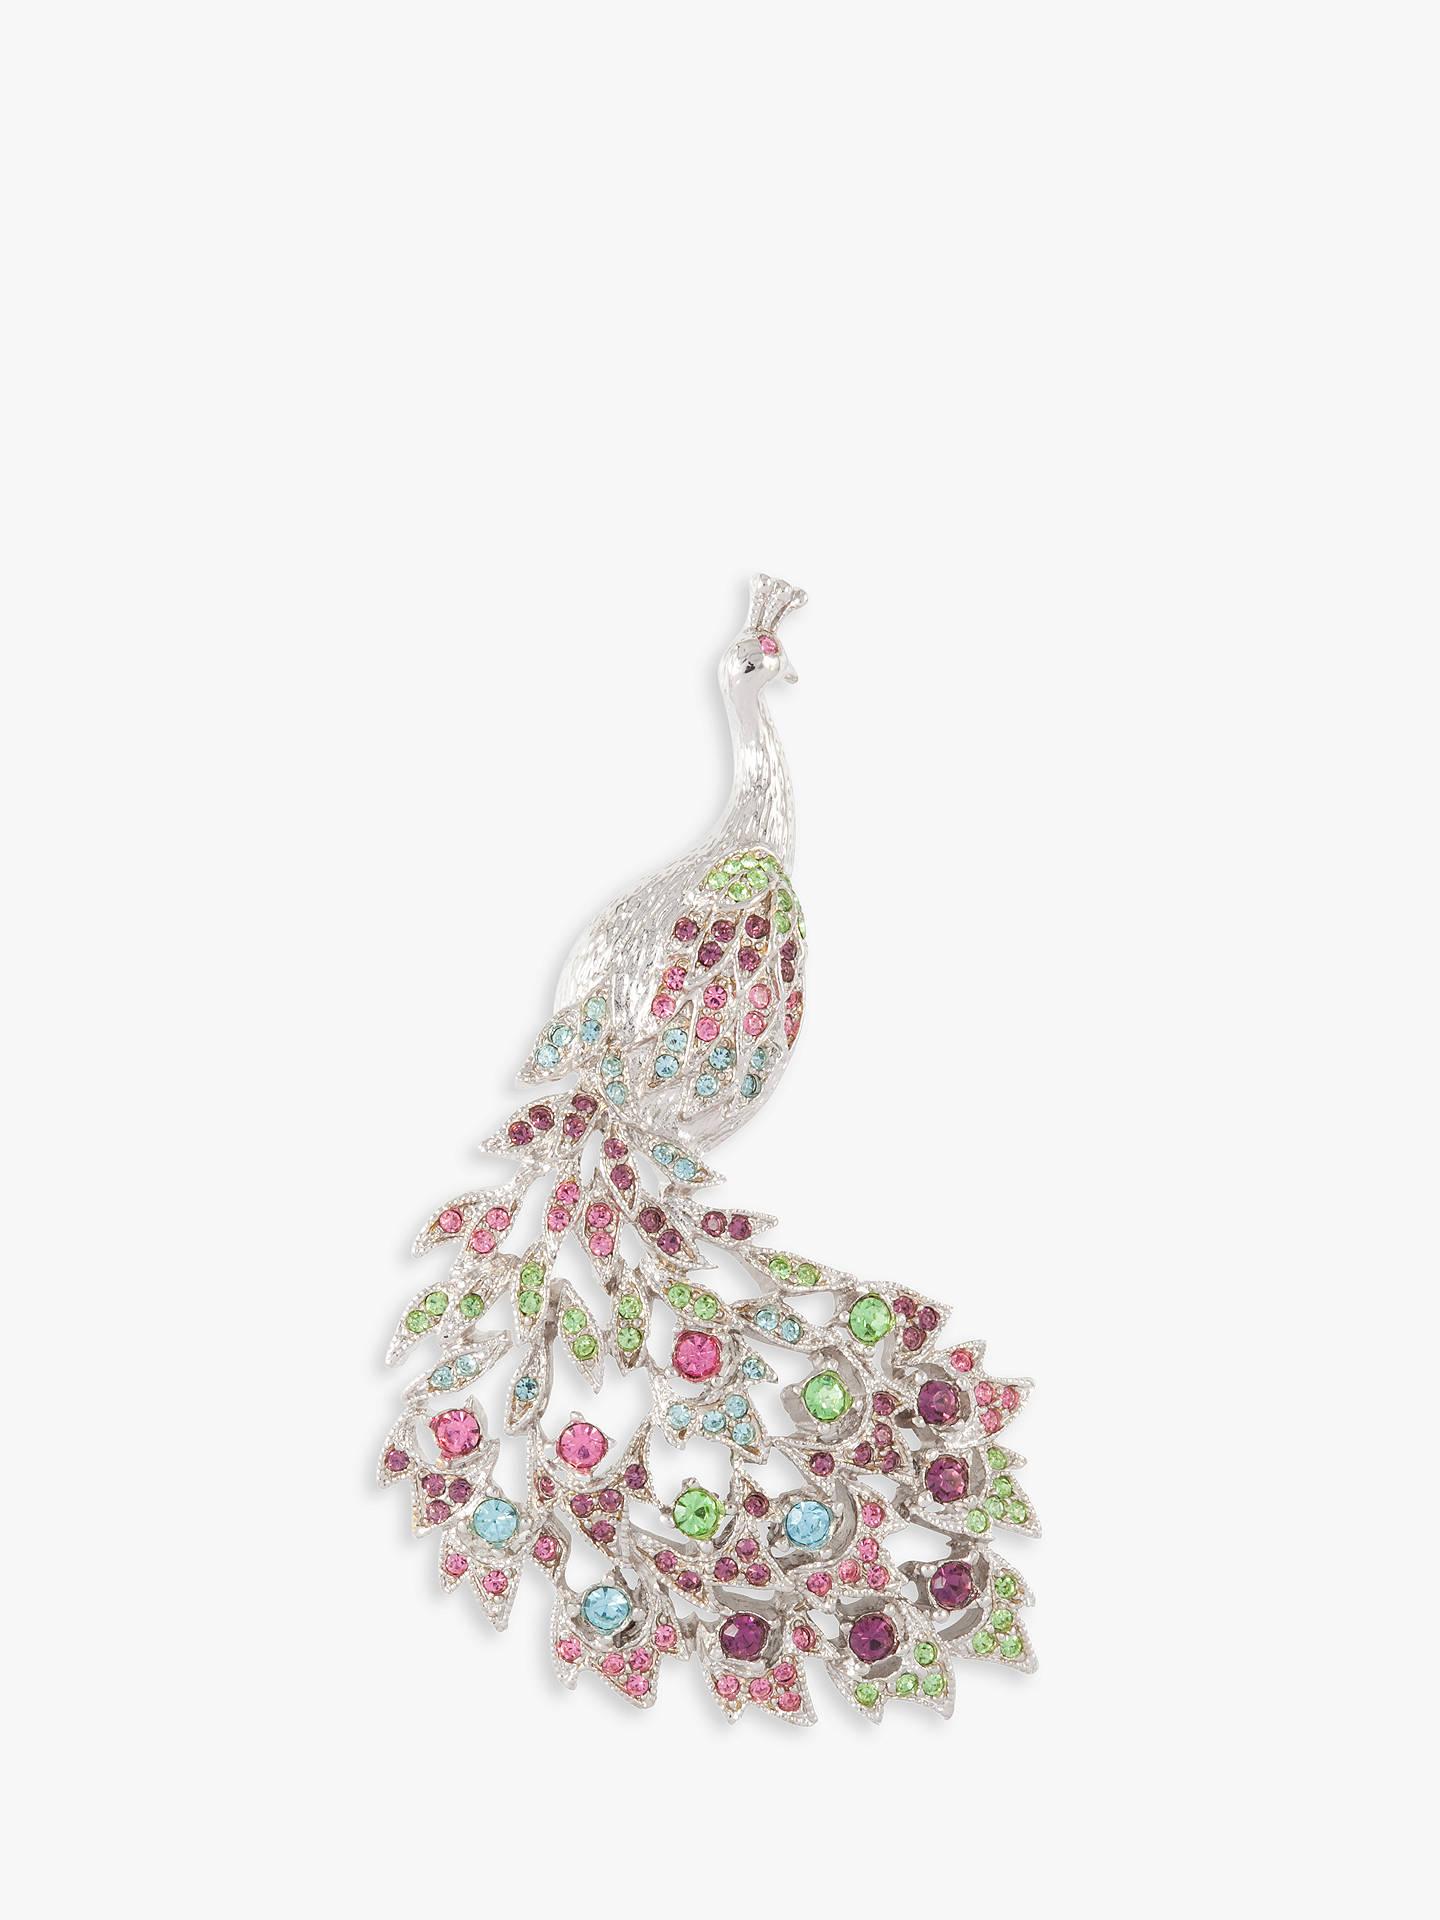 41db235b93d Buy Susan Caplan Vintage D'Orlan Silver Plated Swarovski Crystal Peacock  Brooch, Silver/ ...